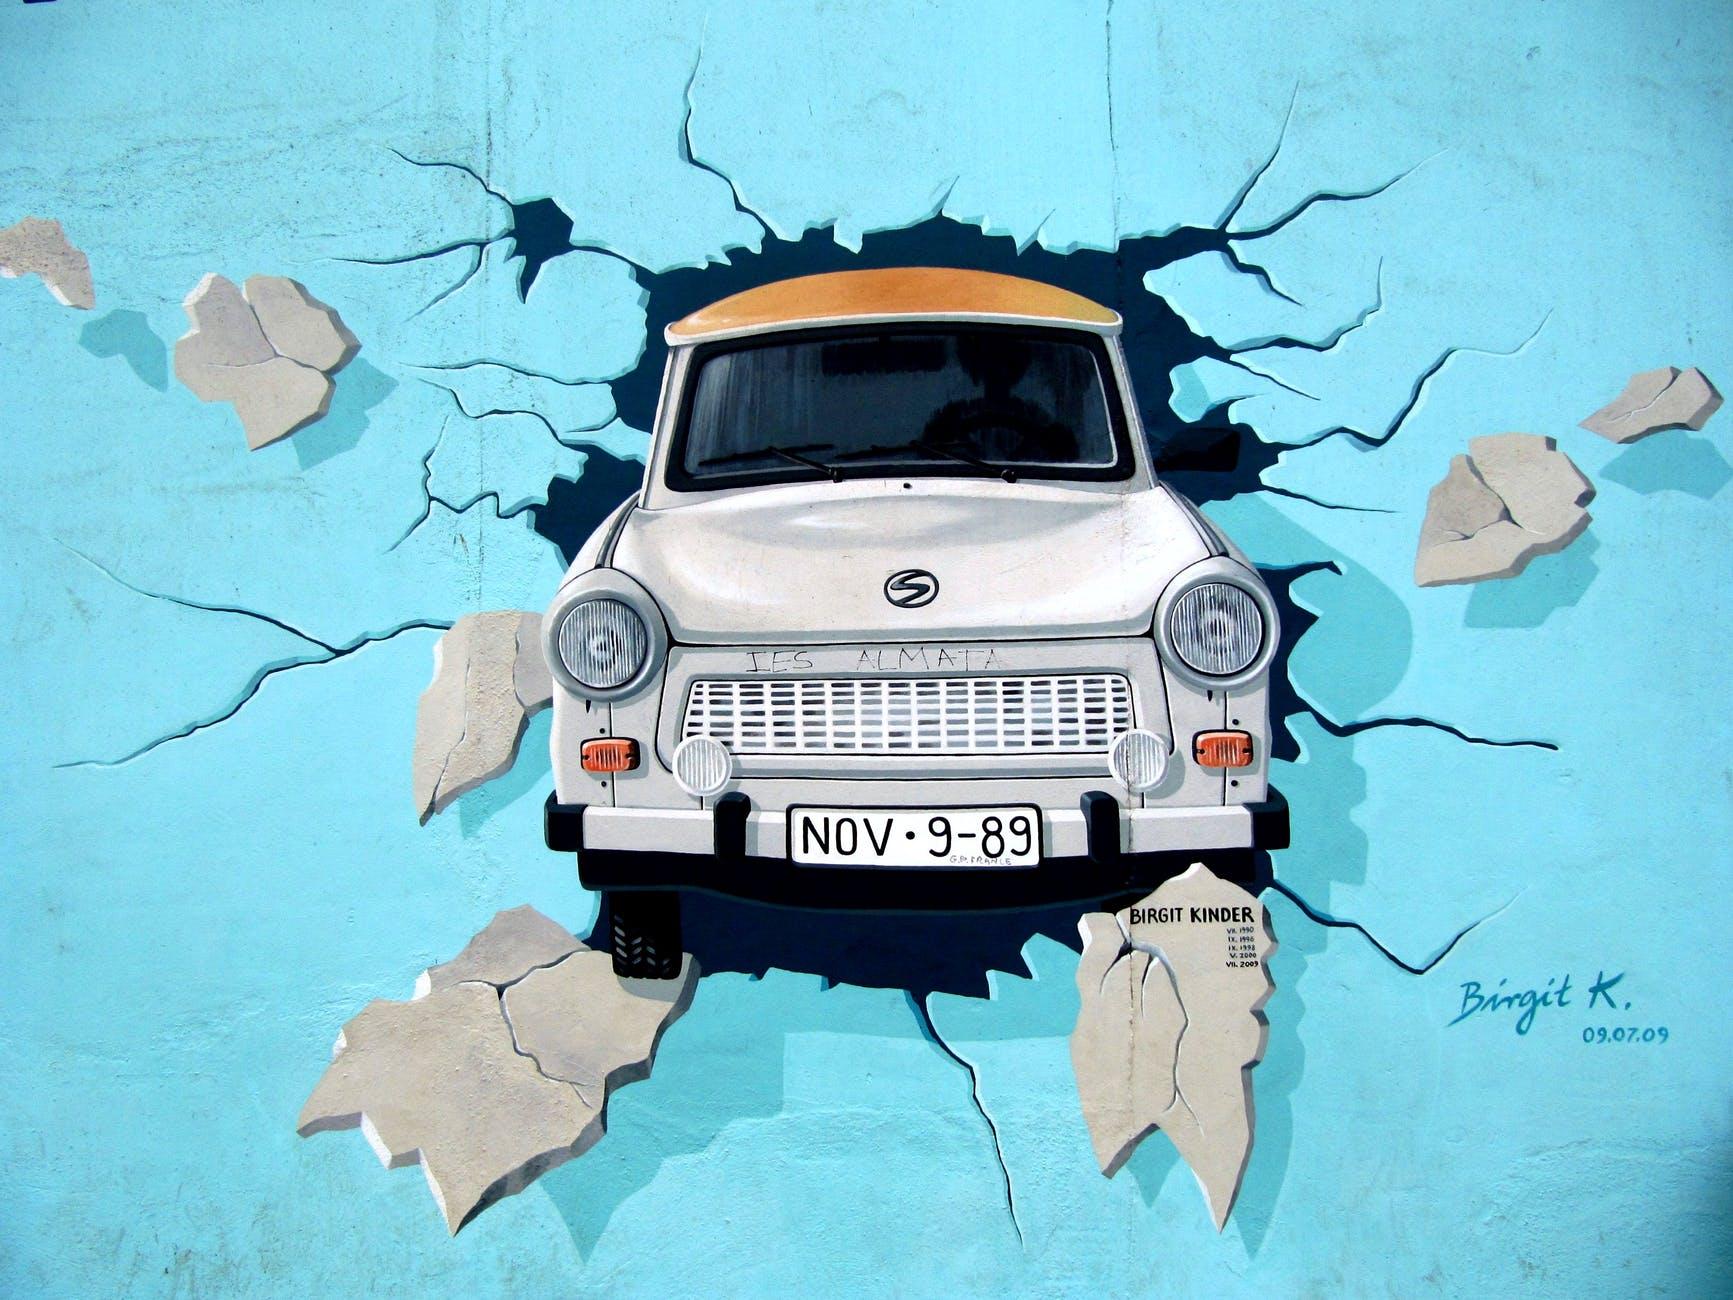 graffiti-berlin-wall-wall-trabi.jpg